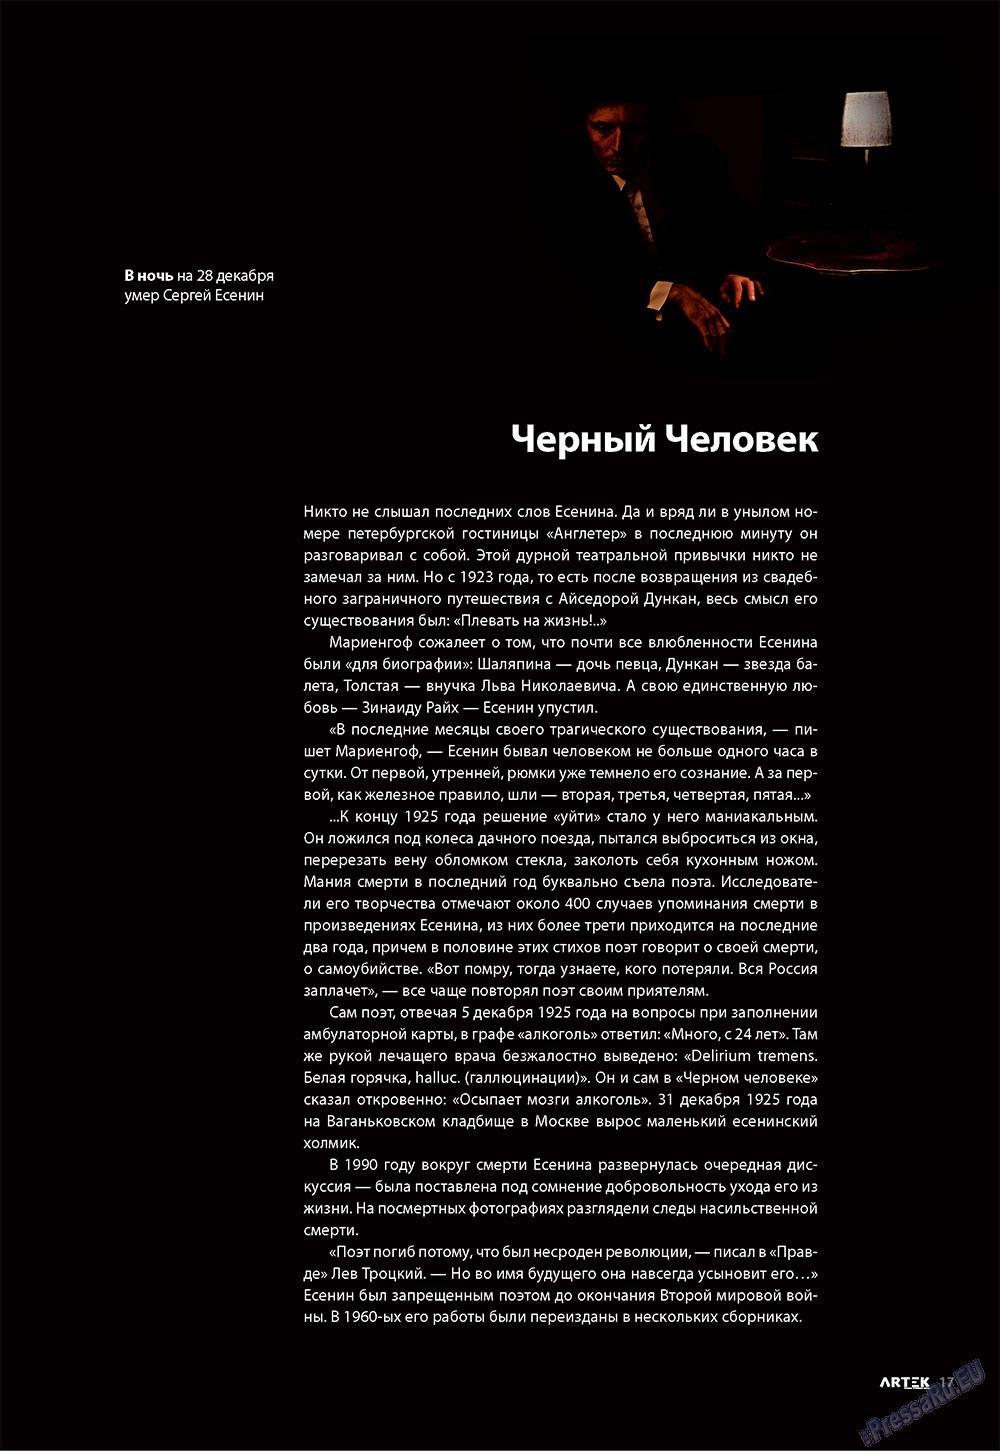 Артек (журнал). 2009 год, номер 4, стр. 17